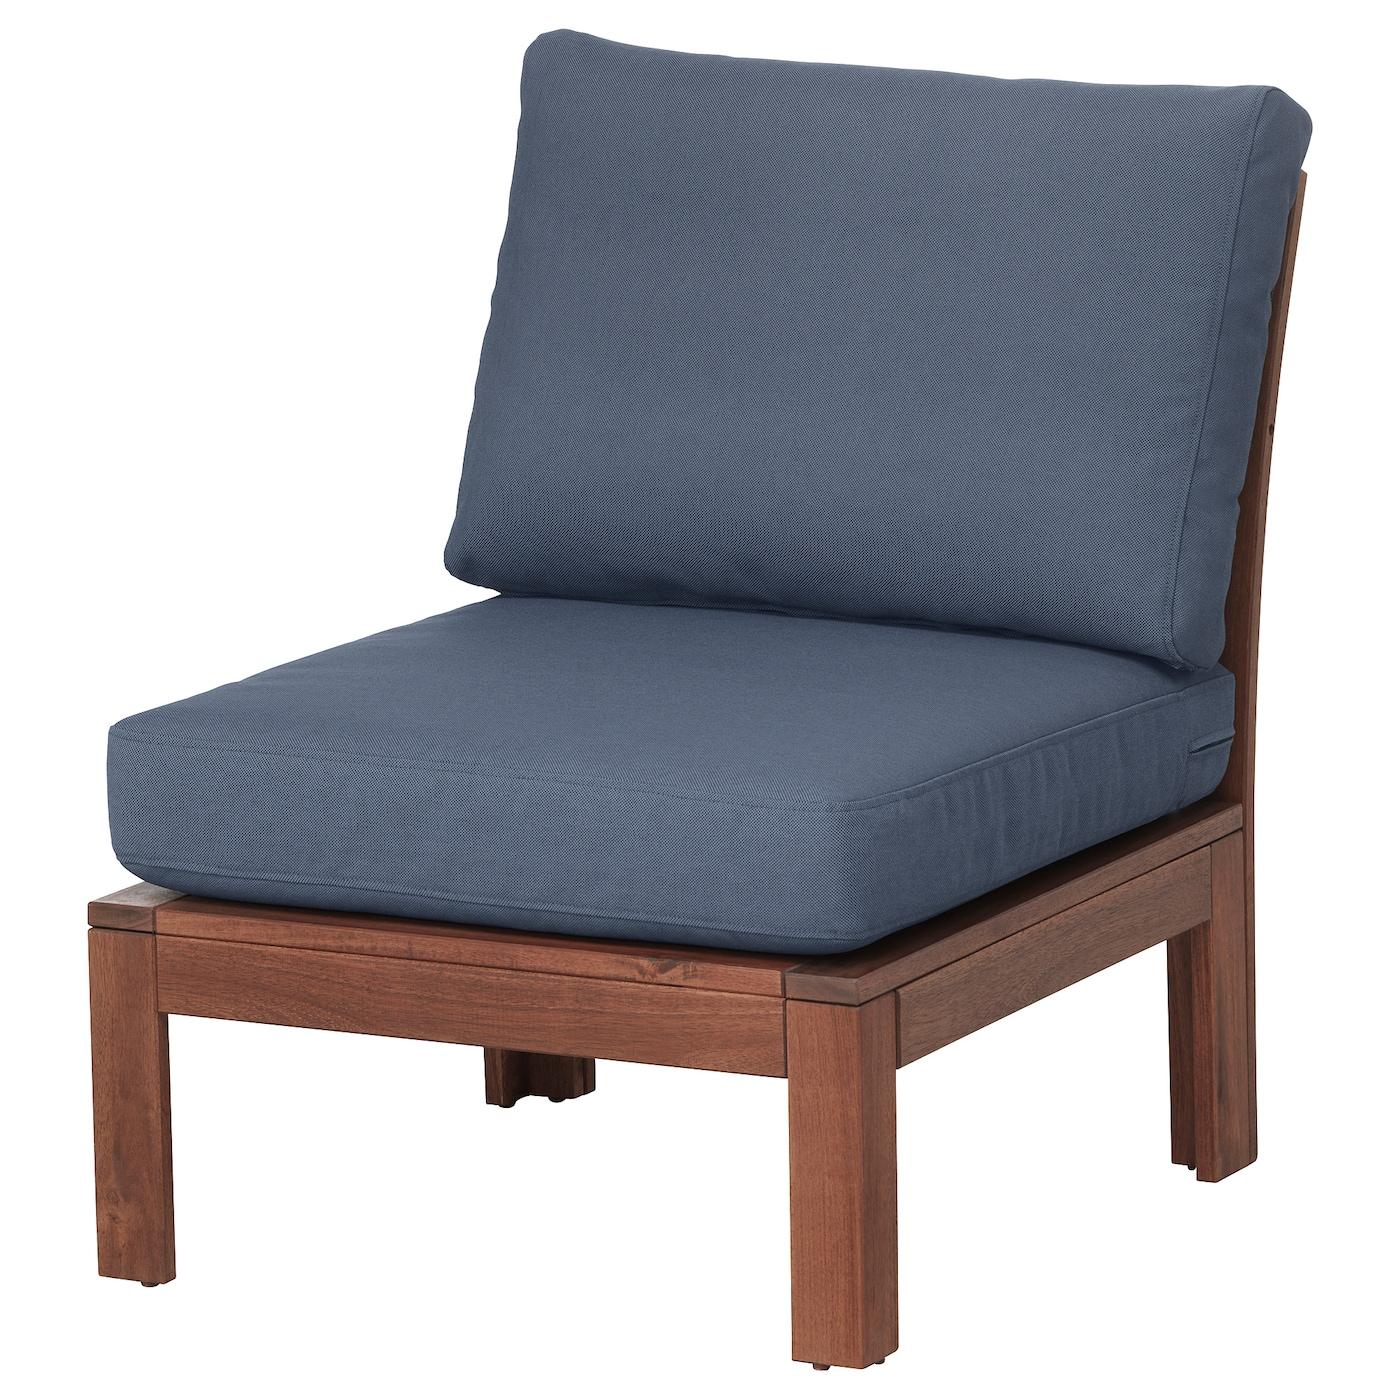 ÄPPLARÖ, Sessel/außen, braun las., blau 292.599.75